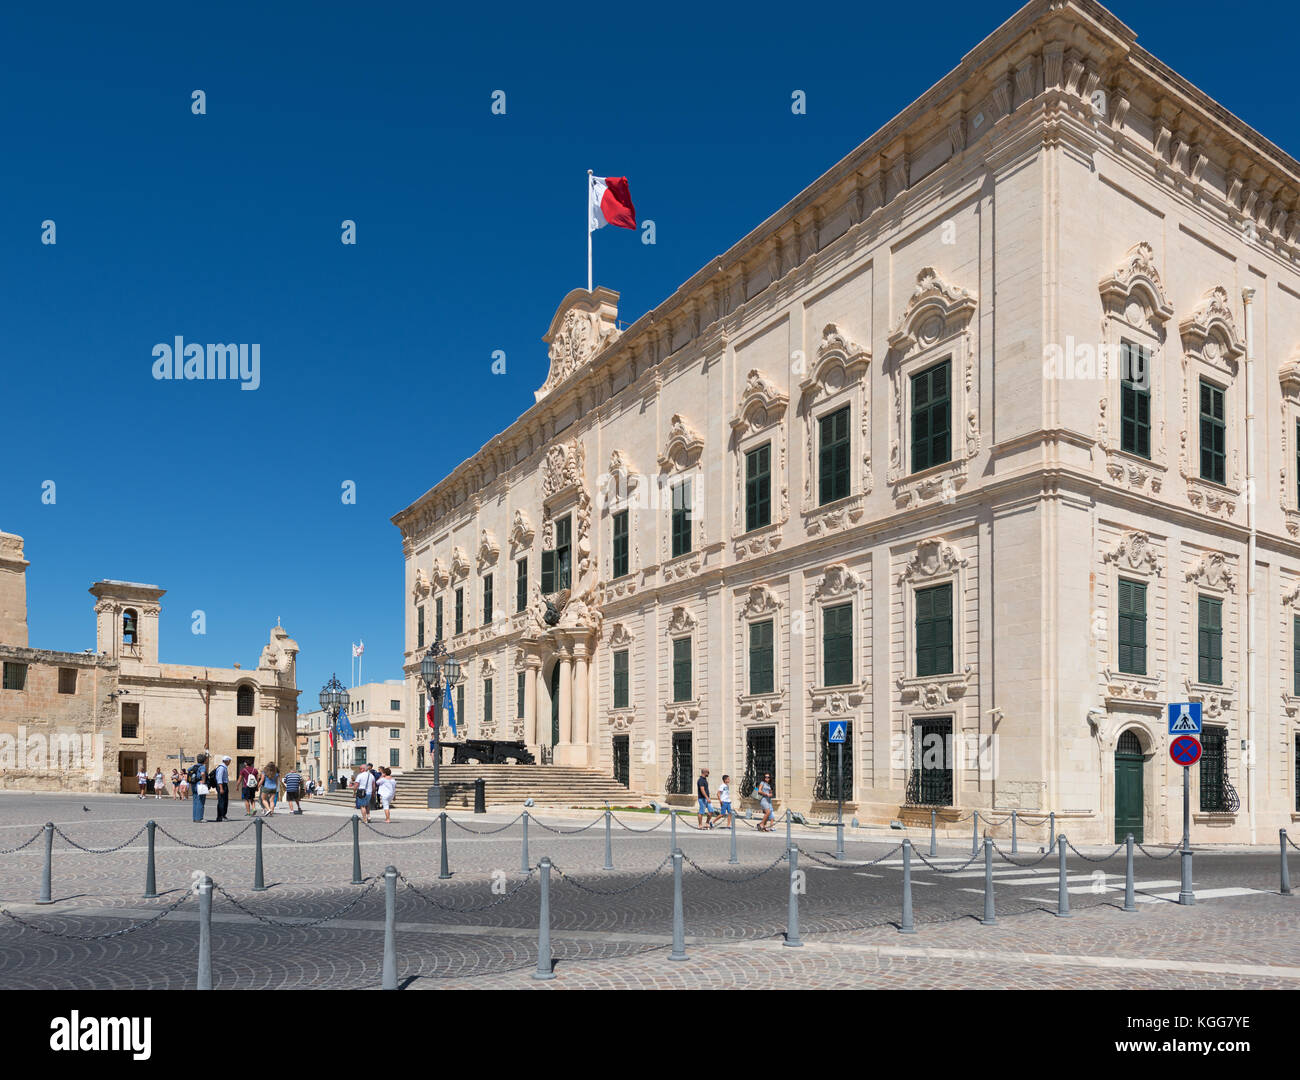 Auberge de Castille, Office of the Prime Minister of Malta. Castille square - Stock Image